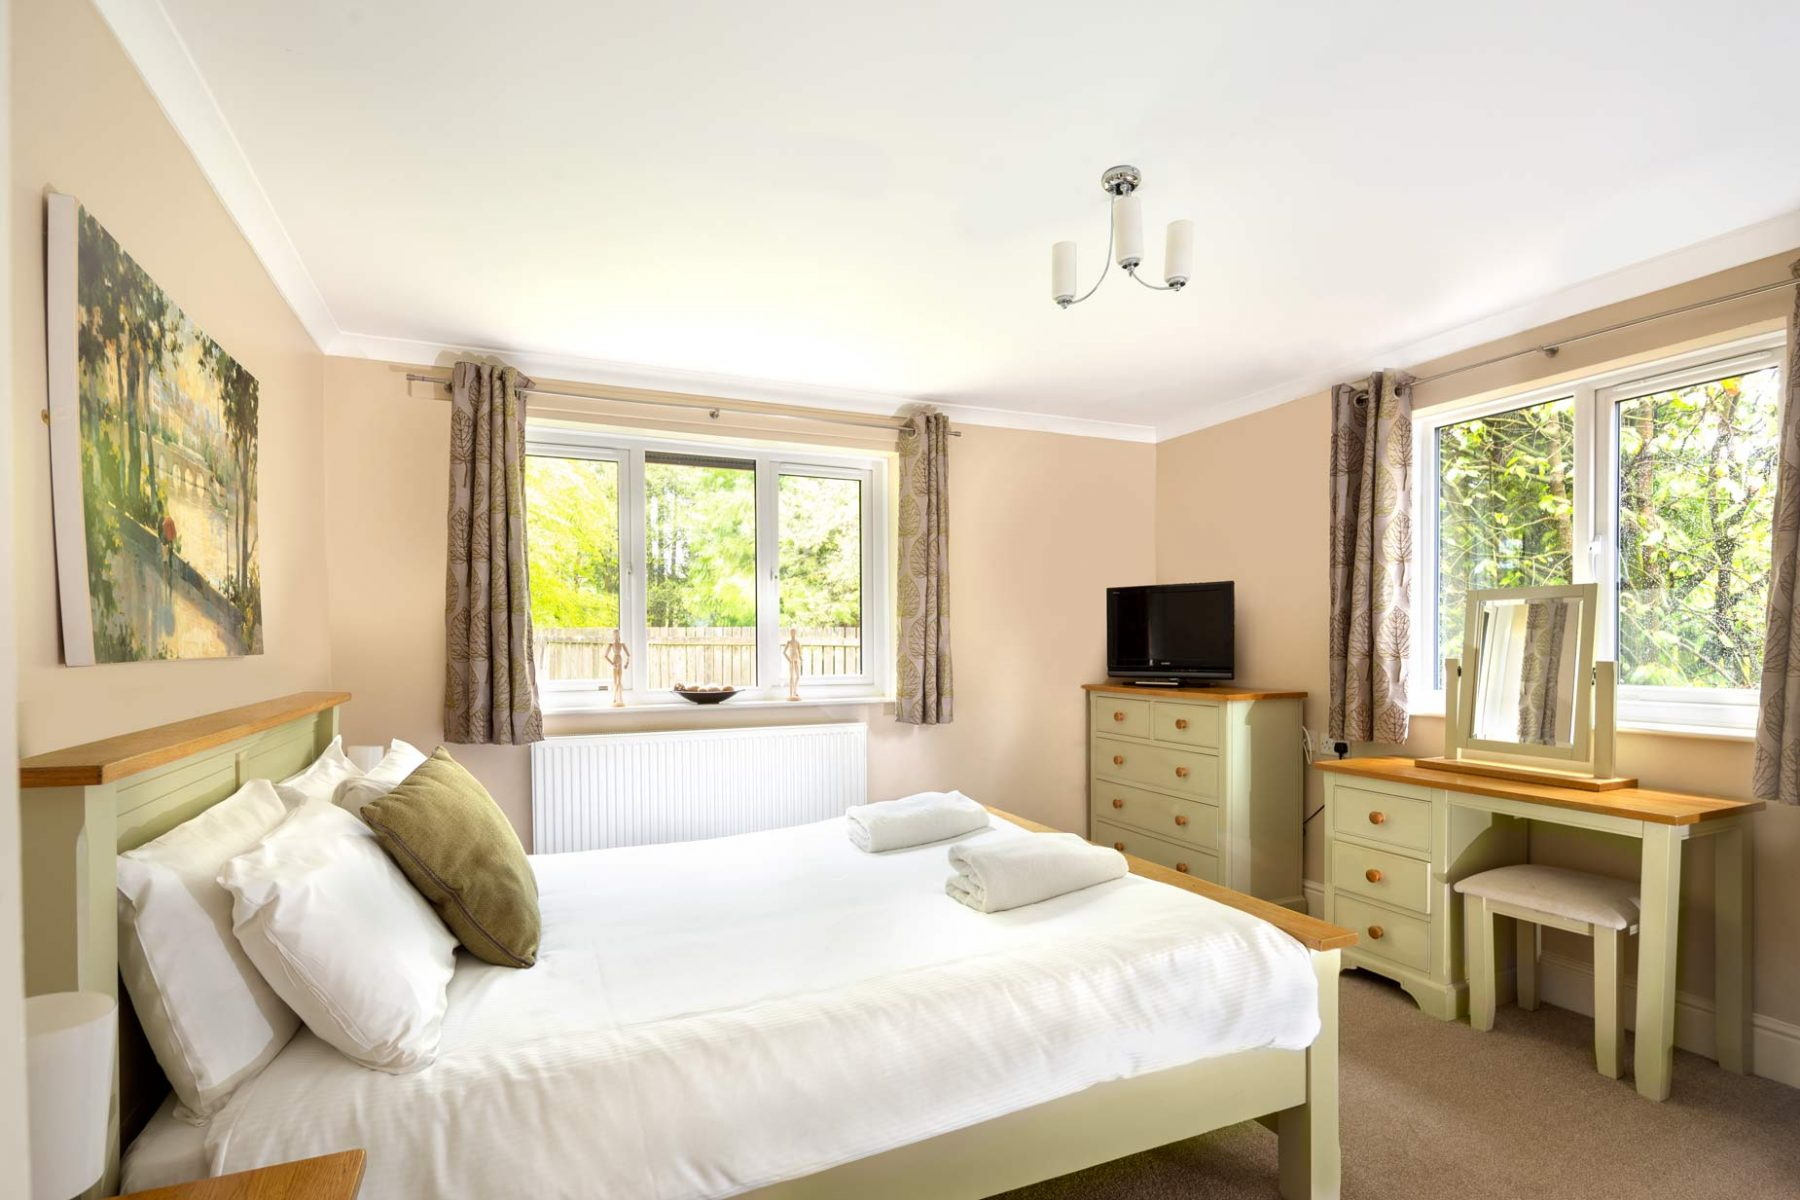 Interior Photography of cottage sage double bedroom by interior photographer Matthew Jones